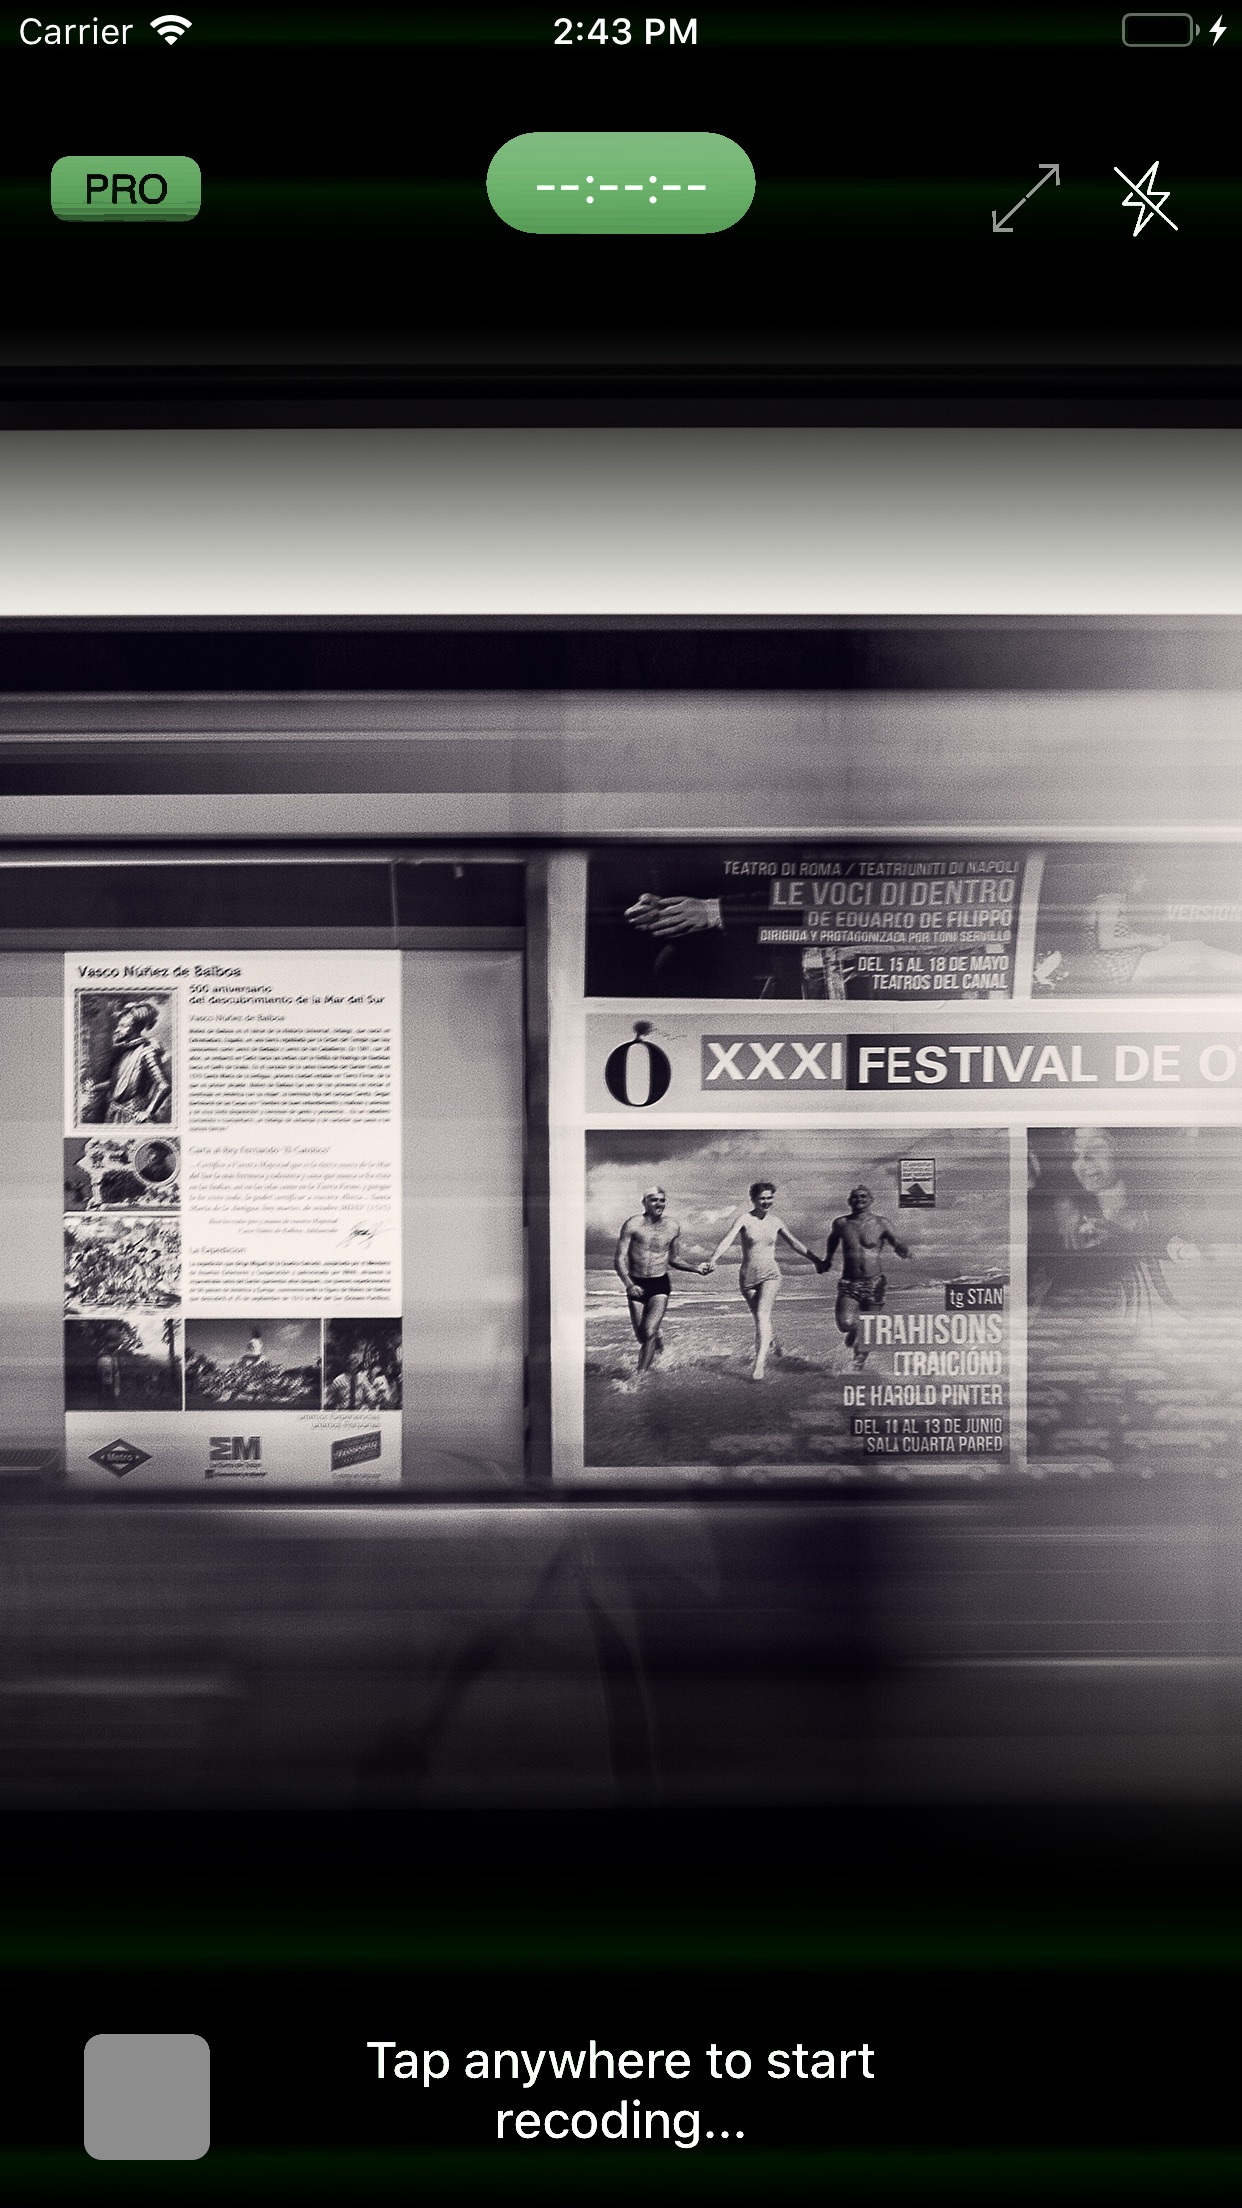 Screenshot do app Carousel Camera